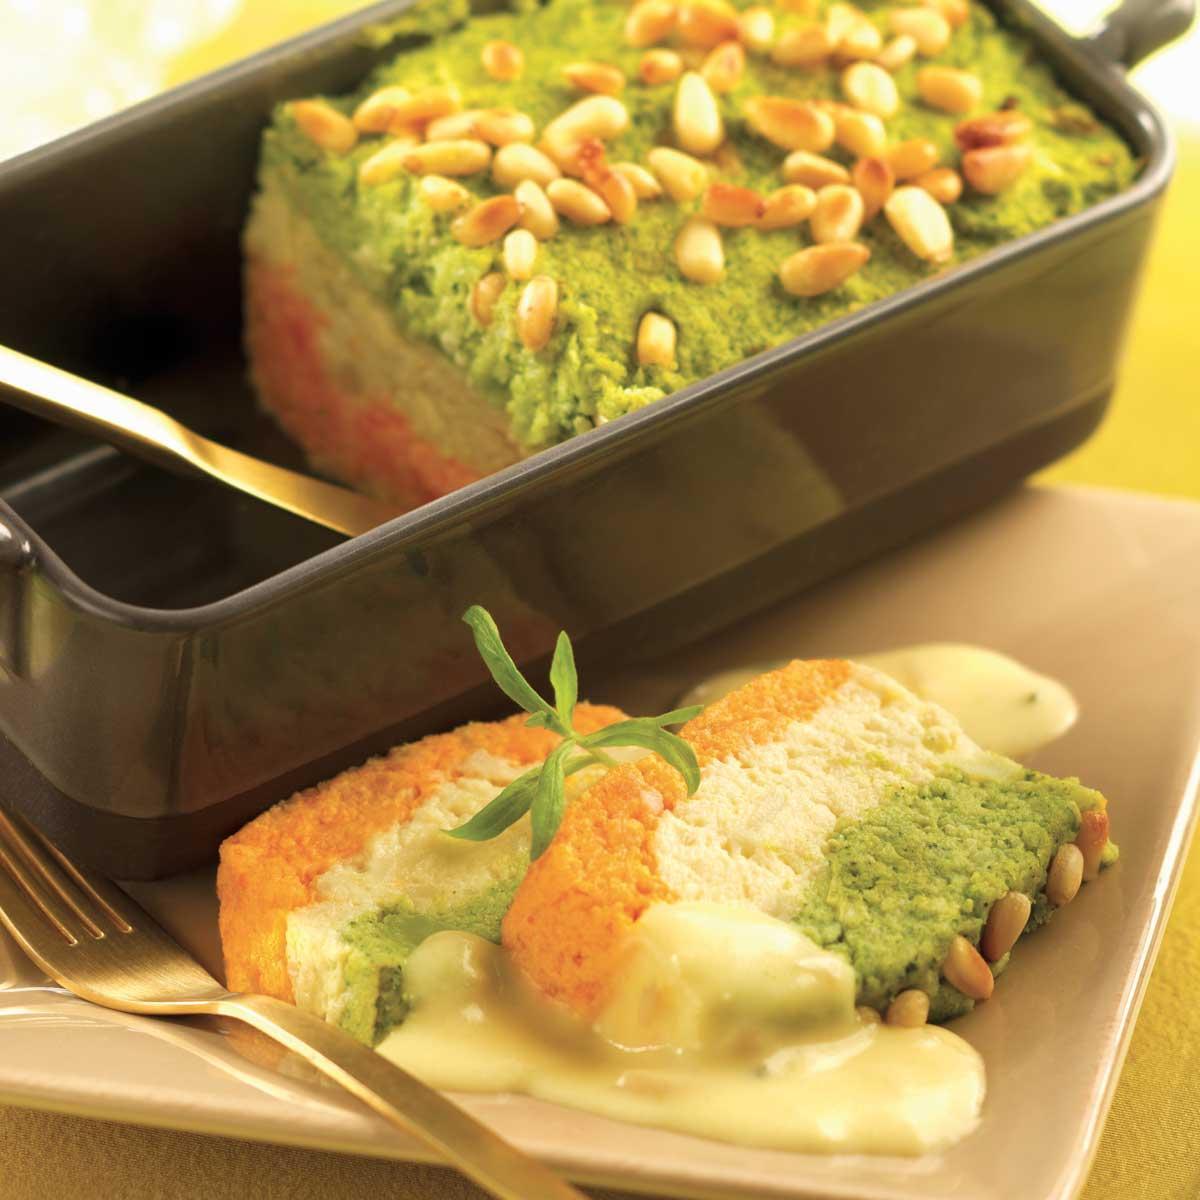 Recette terrine de carottes et brocolis cuisine madame figaro - Site de recettes cuisine ...